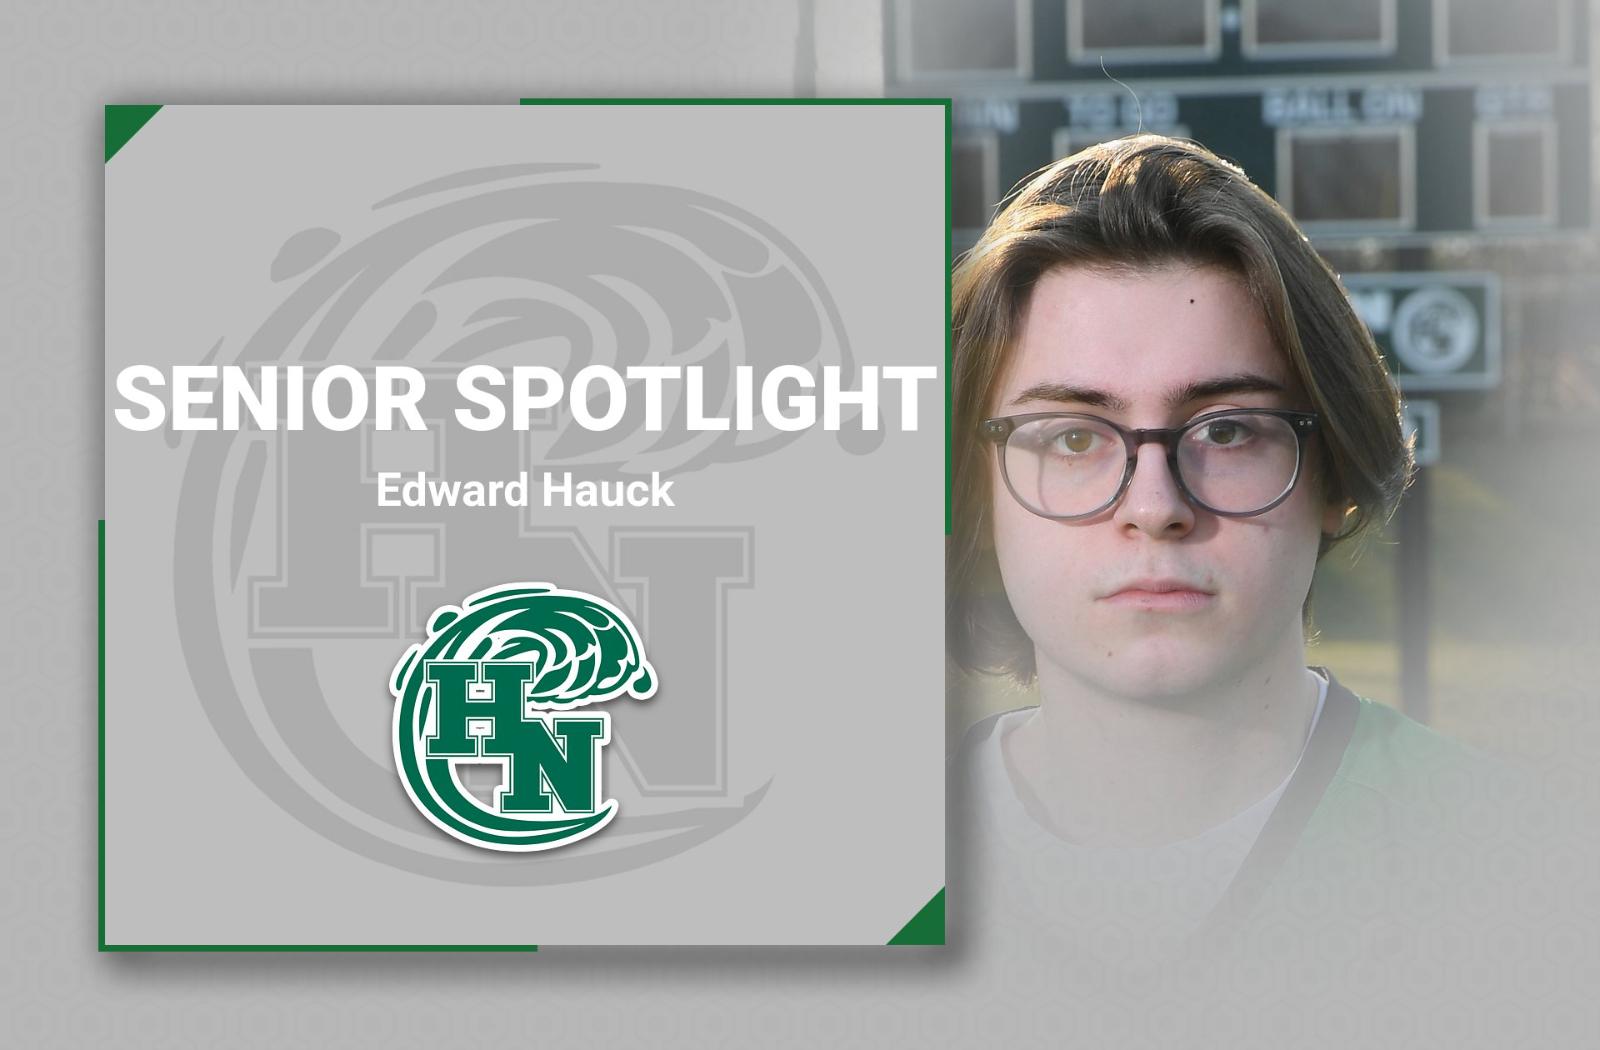 Senior Spotlight: Edward Hauck